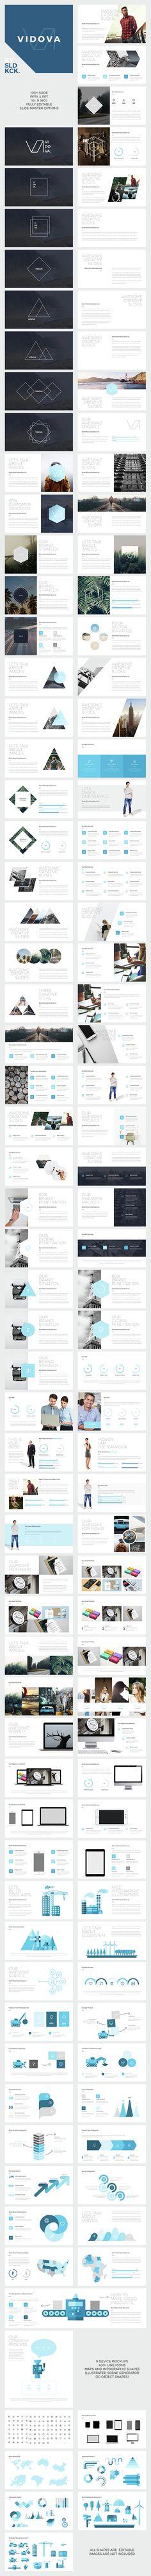 VIDOVA - Modern Powerpoint Presentation (PowerPoint Templates)